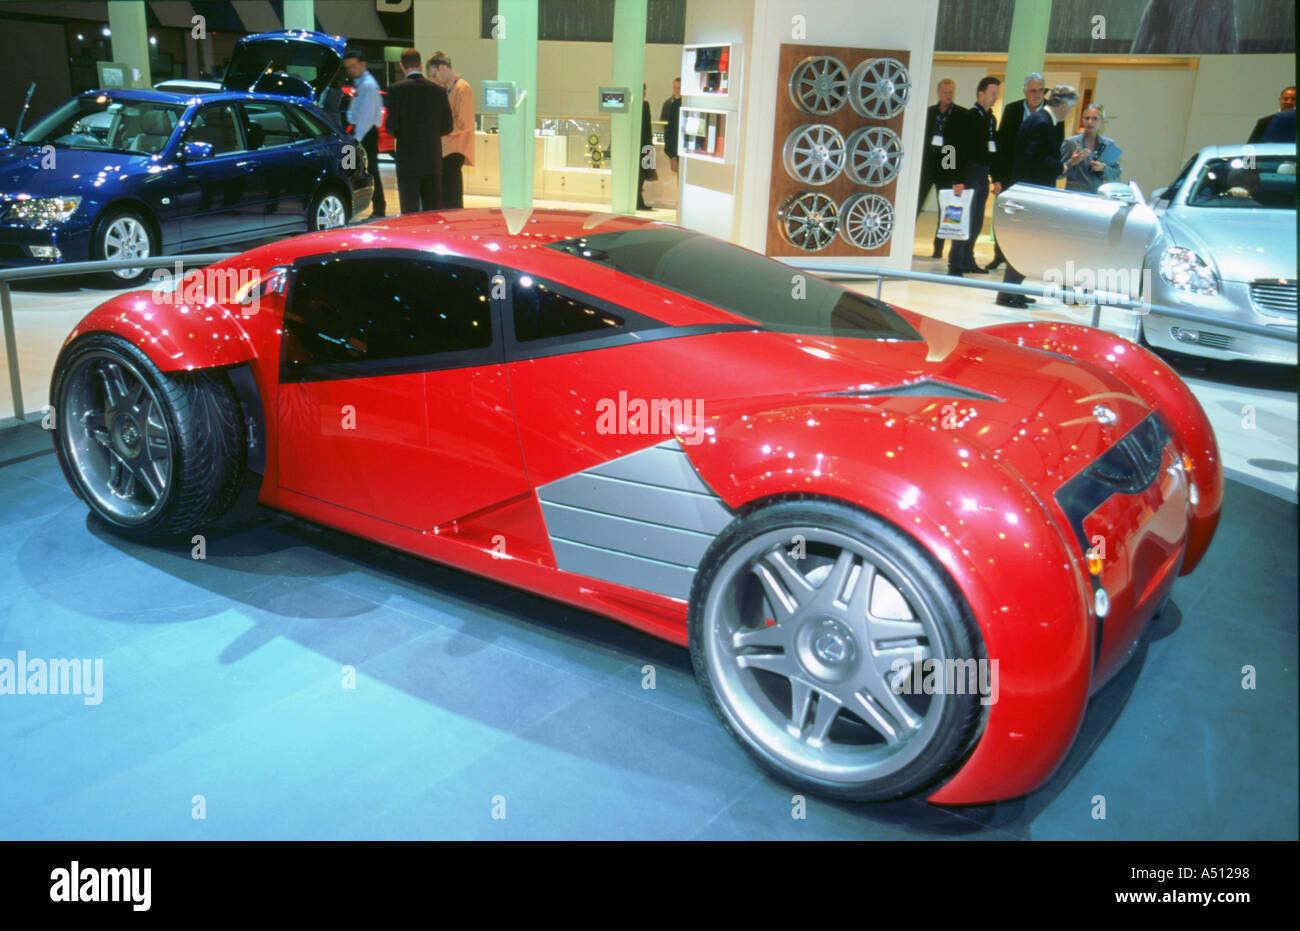 https://c8.alamy.com/comp/A51298/2002-lexus-electric-concept-car-used-in-minority-report-film-A51298.jpg